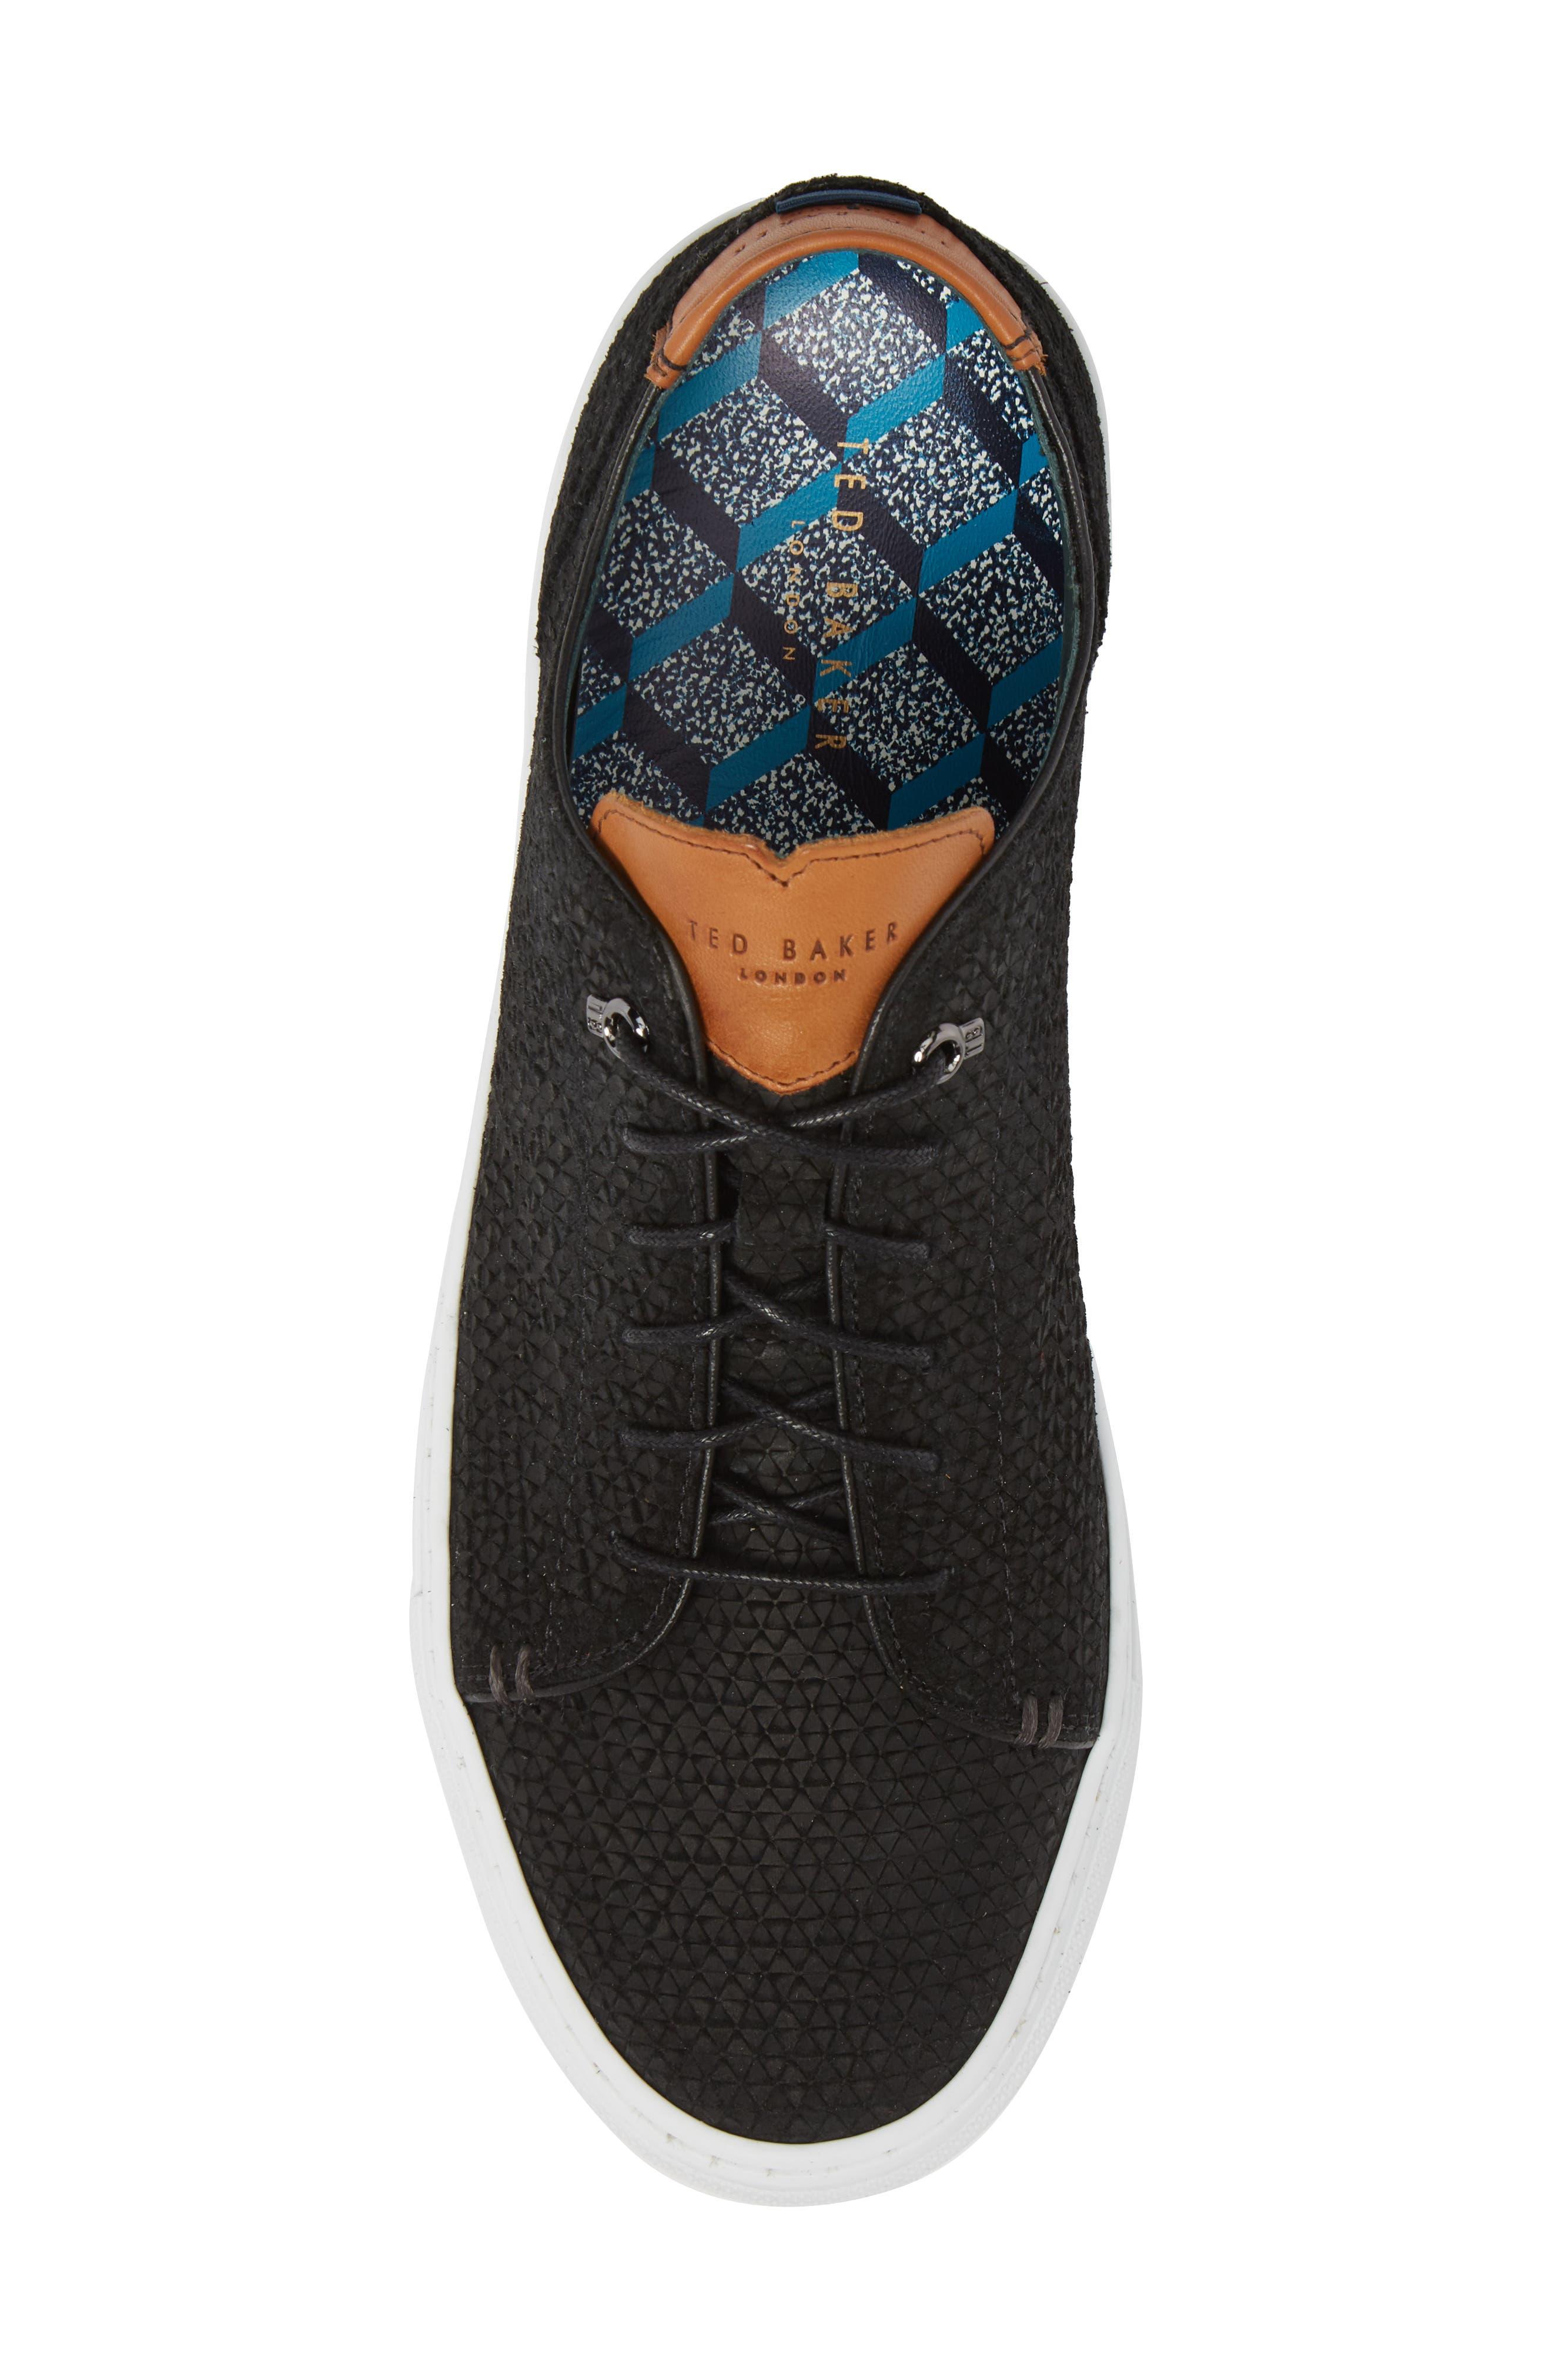 TED BAKER LONDON,                             Duukes Embossed Low Top Sneaker,                             Alternate thumbnail 5, color,                             010